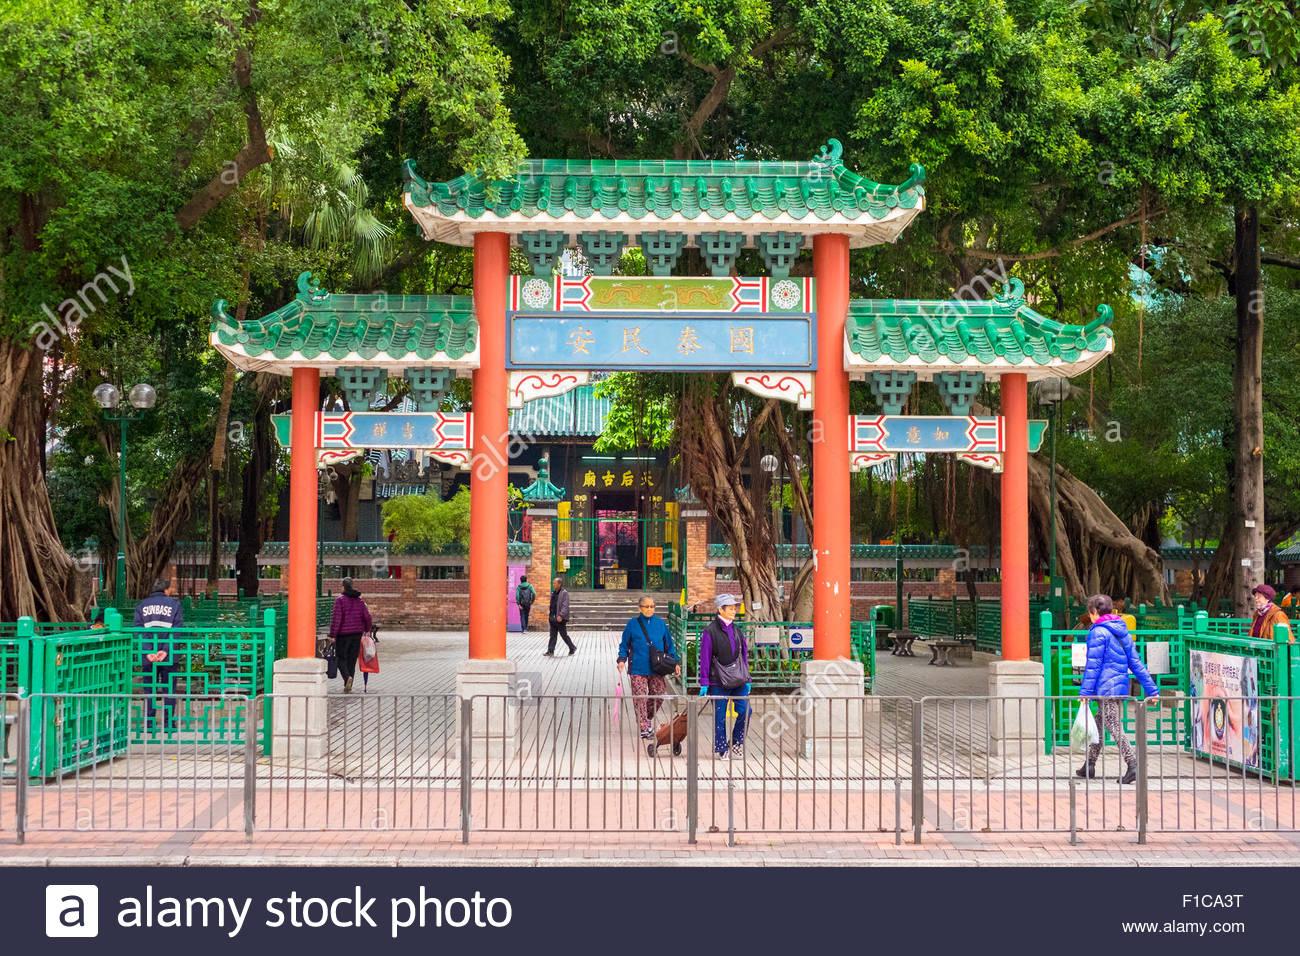 Tin Hau Temple gate in the Yau Ma Tei Community Centre Rest Garden, Yau Ma Tei, Kowloon, Hong Kong, China - Stock Image